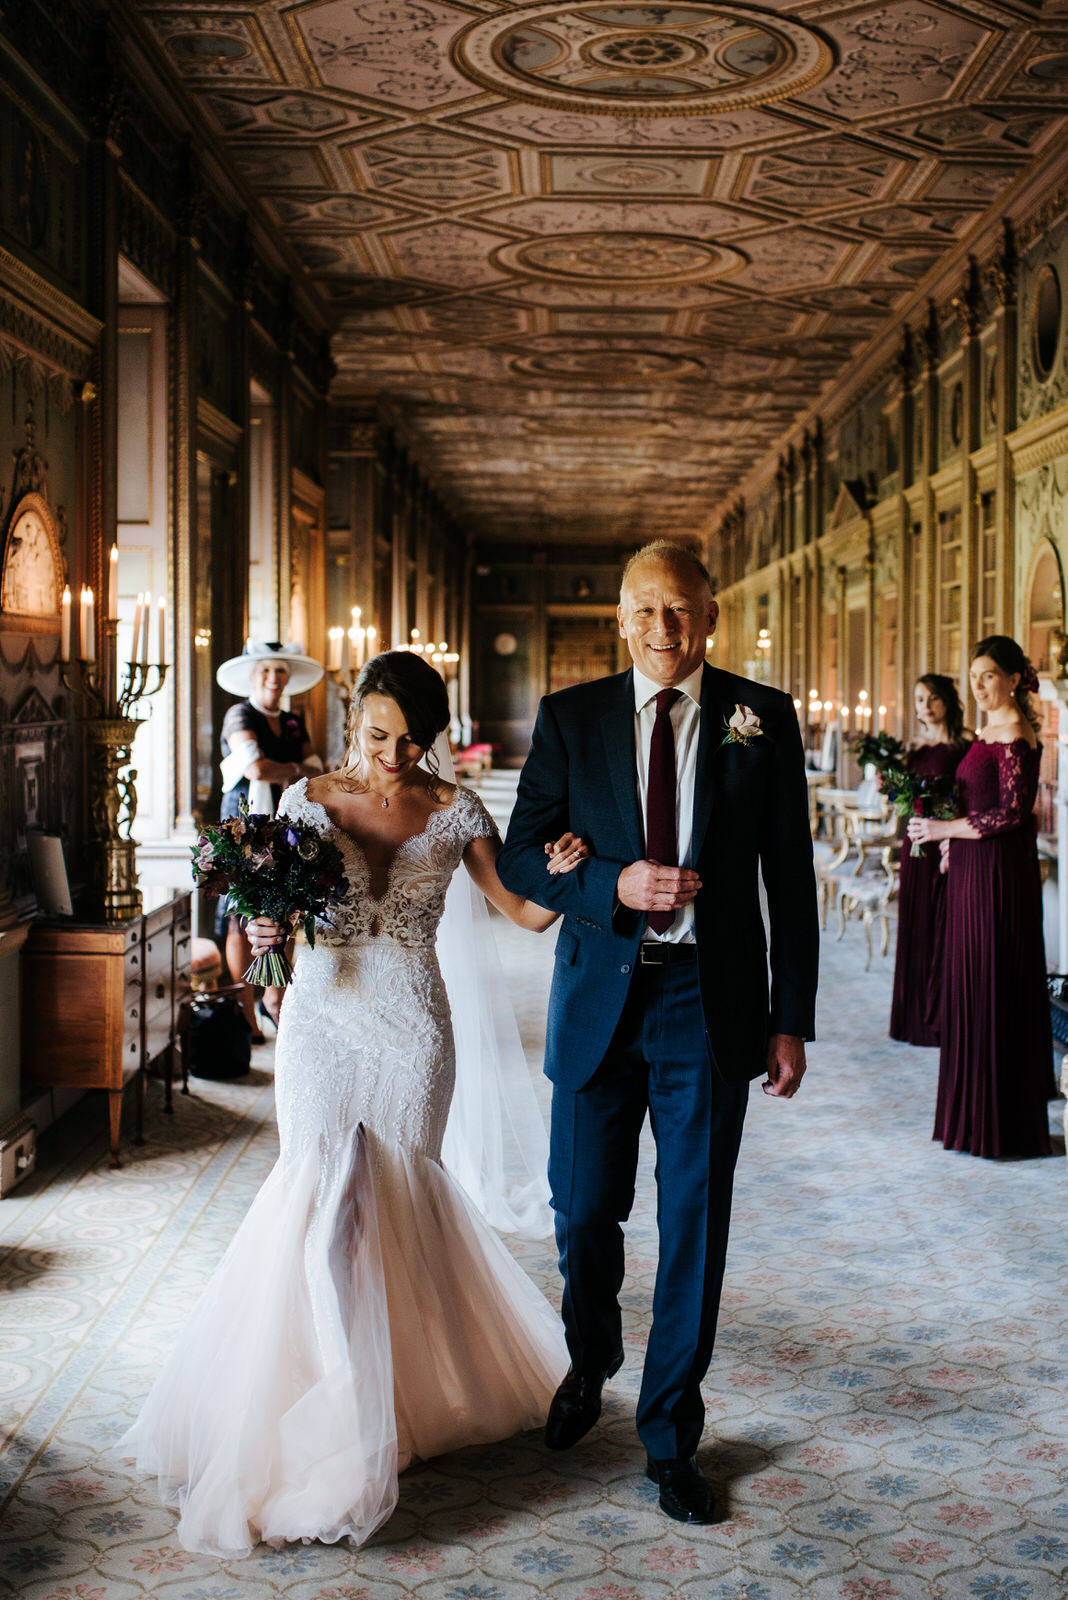 Bride and step-dad walk towards the aisle as mum and bridesmaids look joyfully from behind